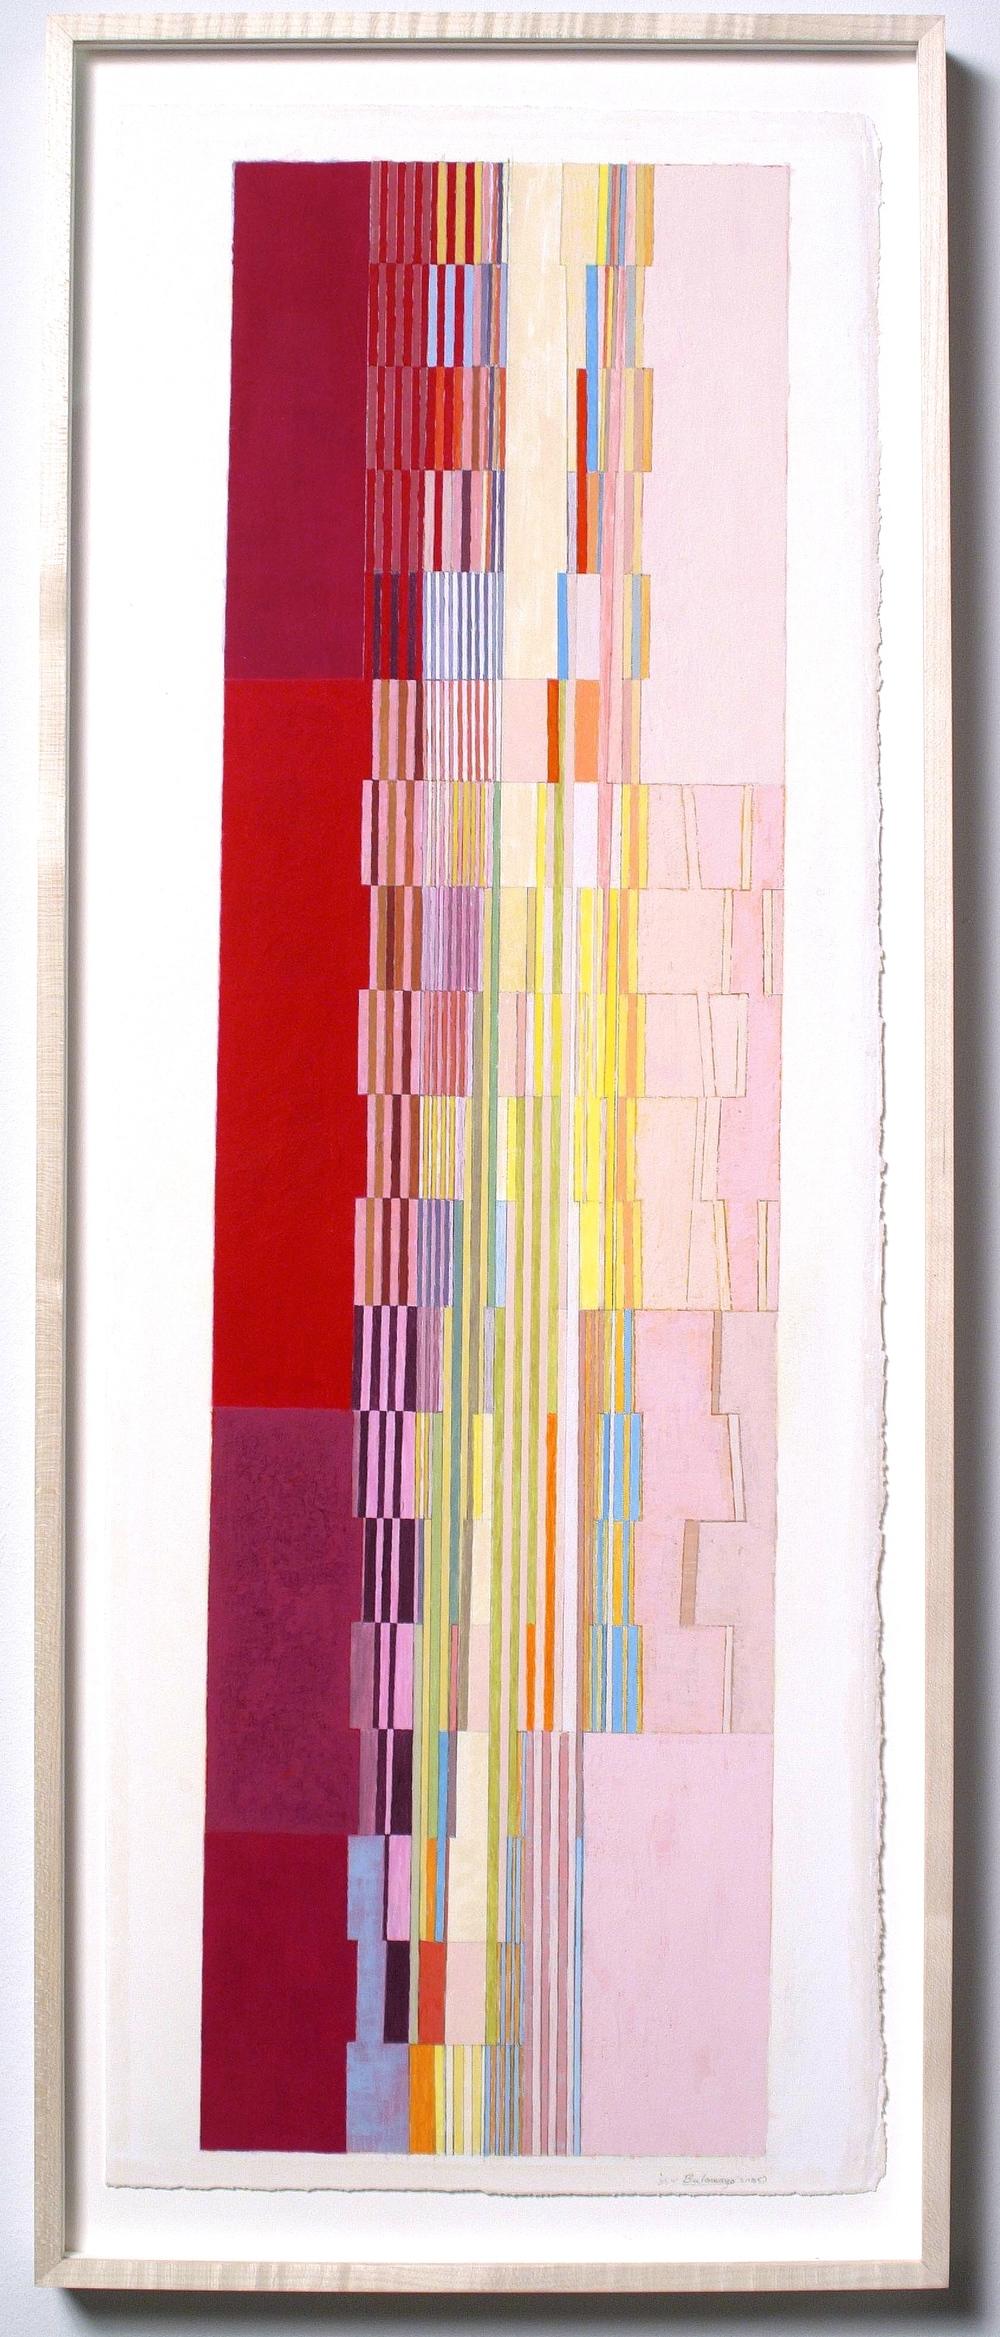 "Bulawayo (PG61), 2006, gouache on paper, 28 ½ x 8"" (image), 29 6/8""x11"" (paper)"